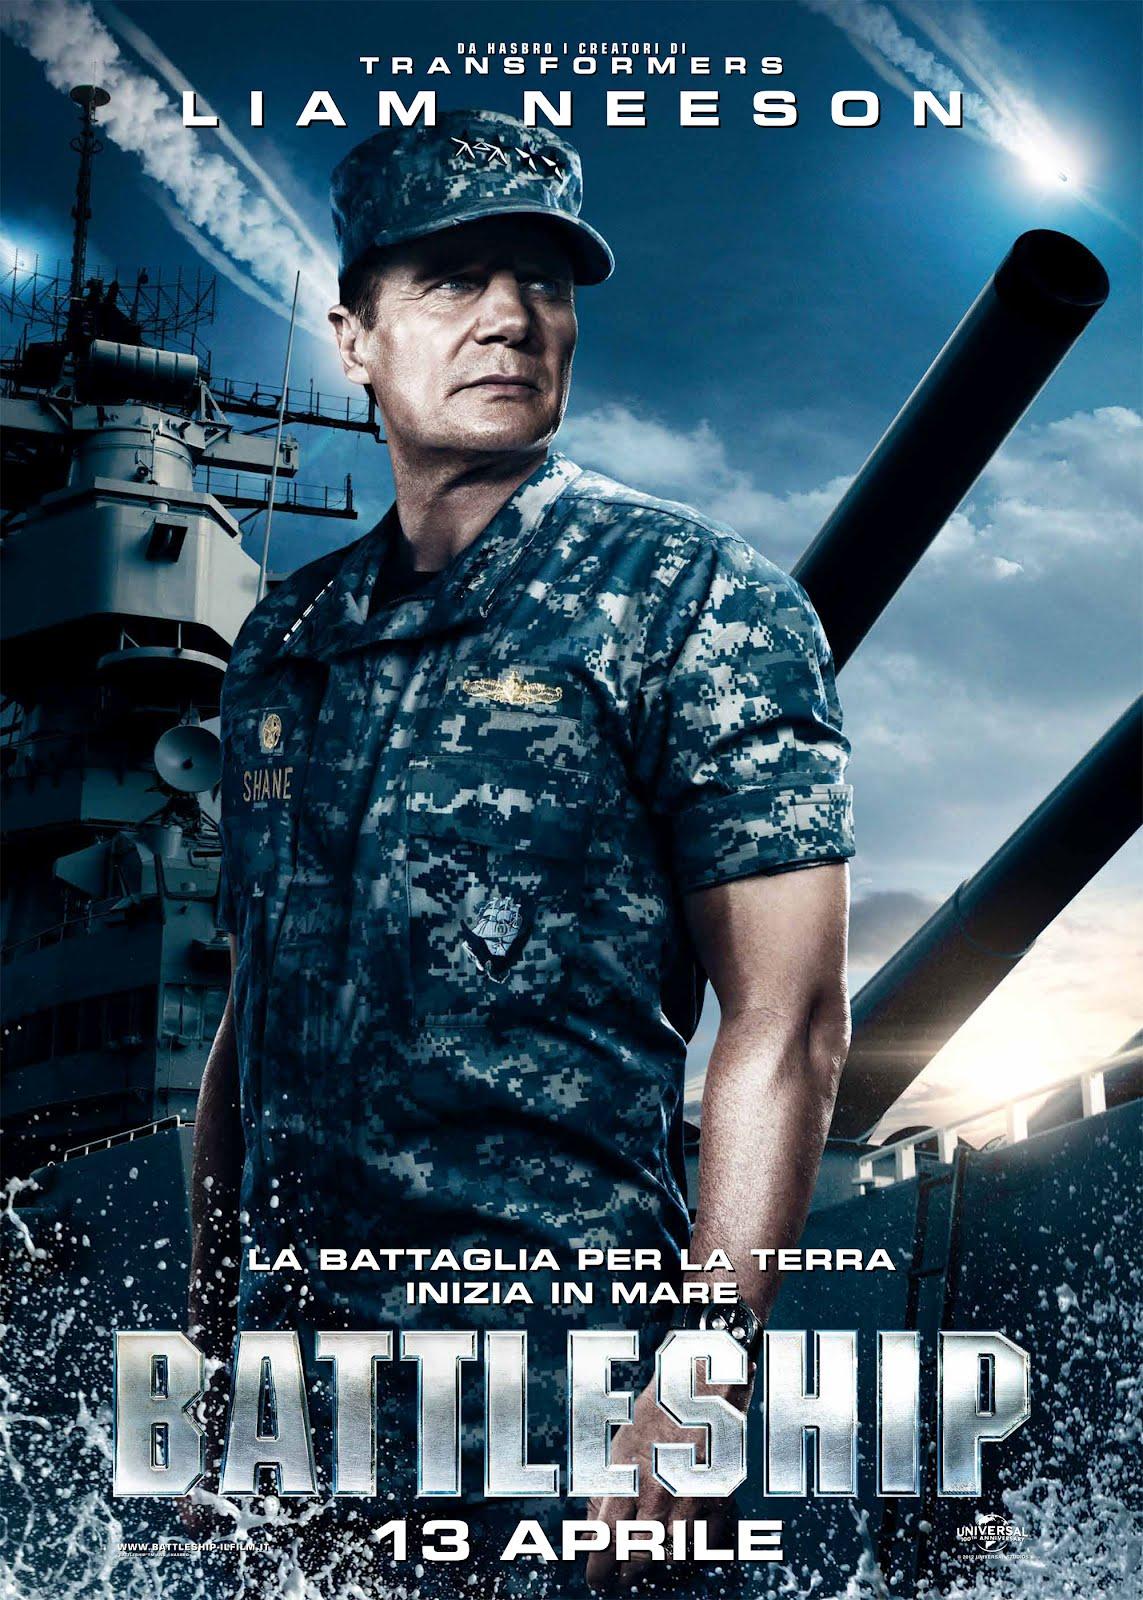 http://3.bp.blogspot.com/-9DgNDCzc0ug/T1GYgzyYCGI/AAAAAAAADbQ/dJZl5ywu9Z0/s1600/battleship-movie-poster-liam-neeson.jpg